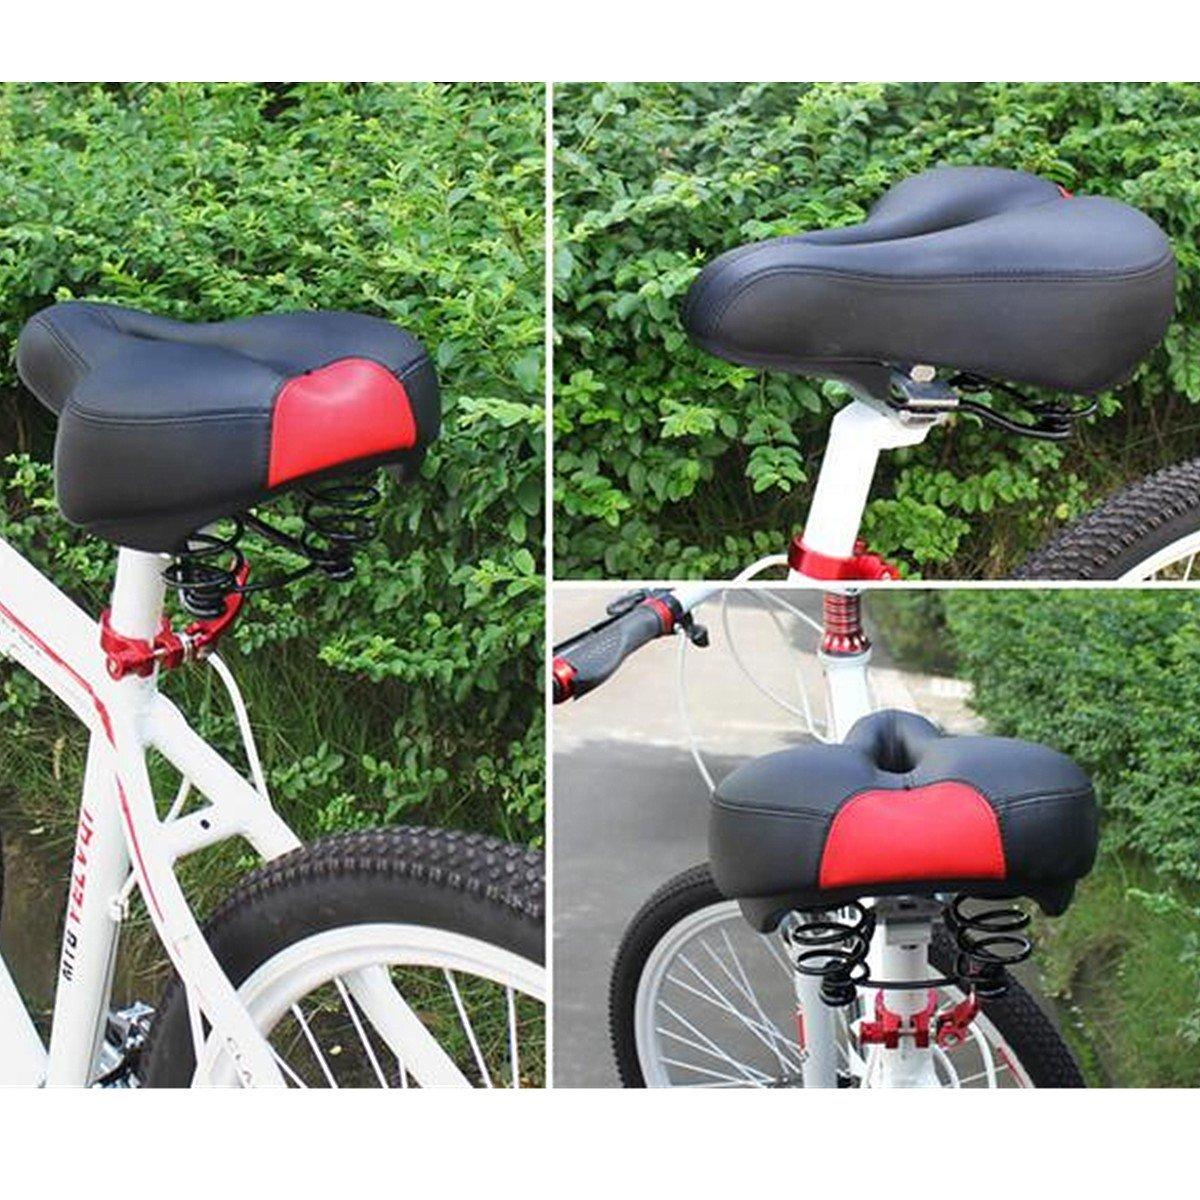 TENGGO Wide Bum Bicycle Foam Cruiser Cruiser Cruiser Extra Comfort Sporty Soft Pad Saddle Seat-Grün B07BS7PZD3 Multifunktionswerkzeug Qualitätsprodukte 7d0308